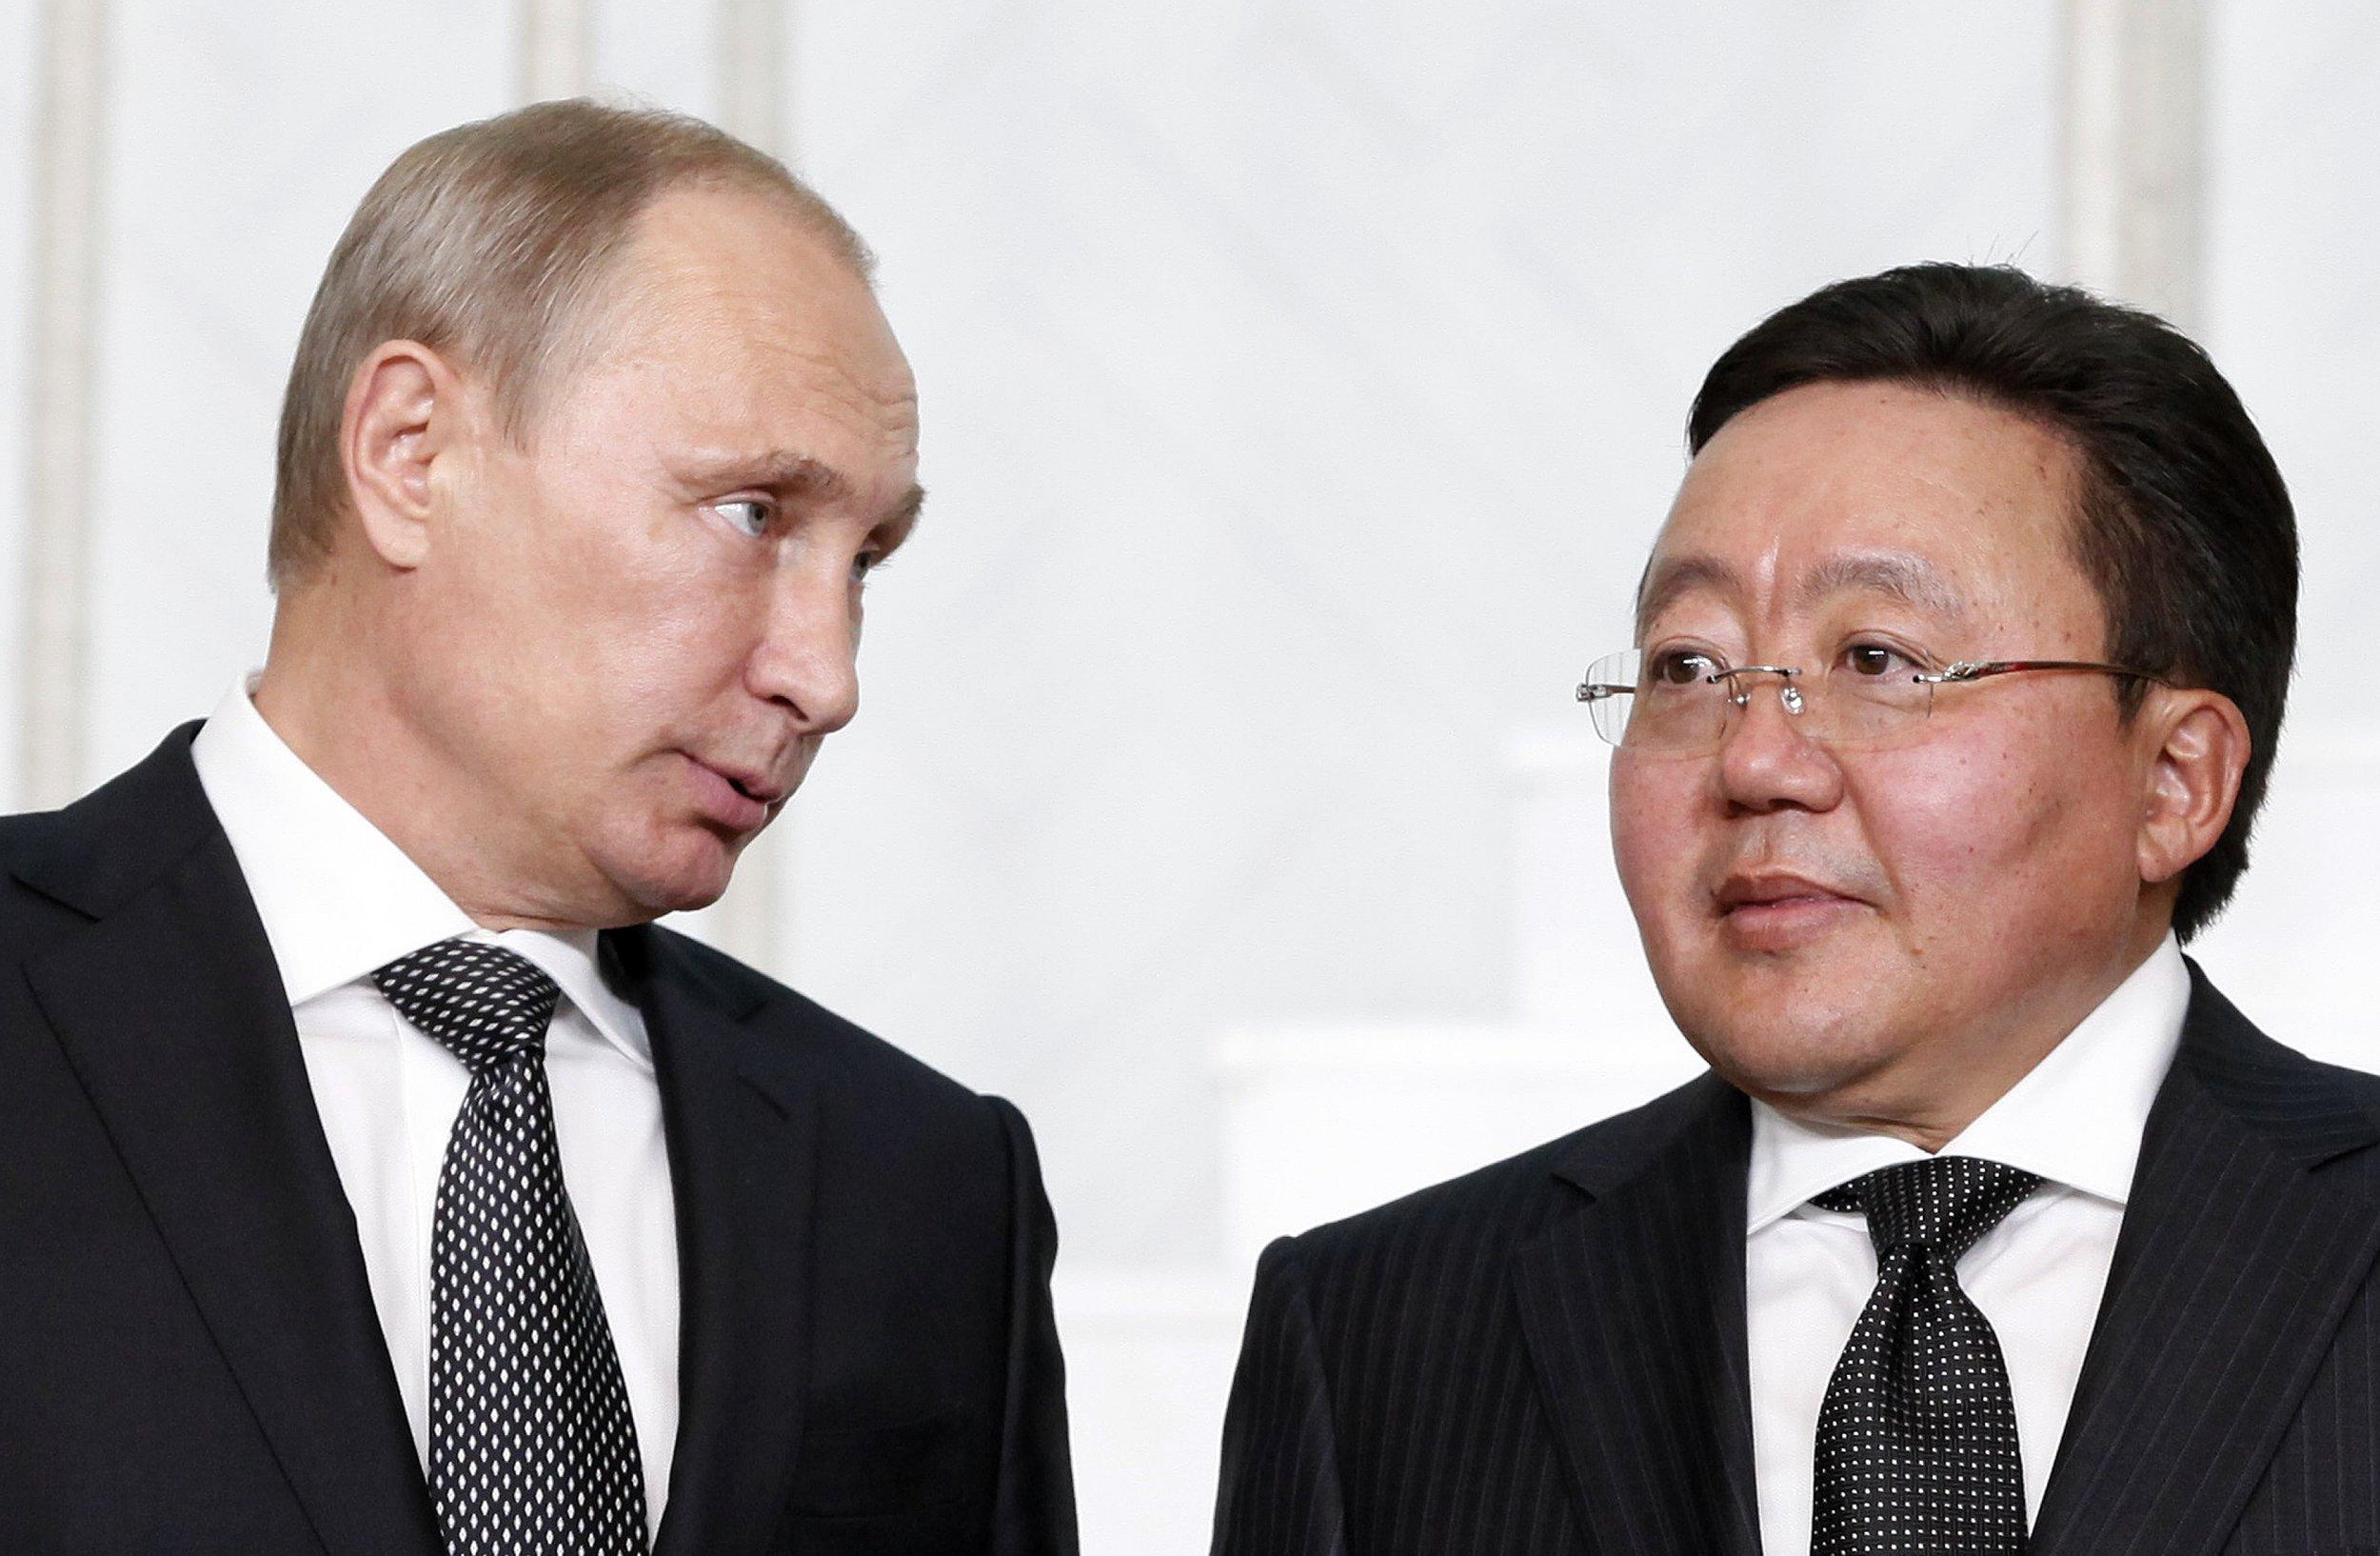 Putin looks at Mongolian President Elbegdorj